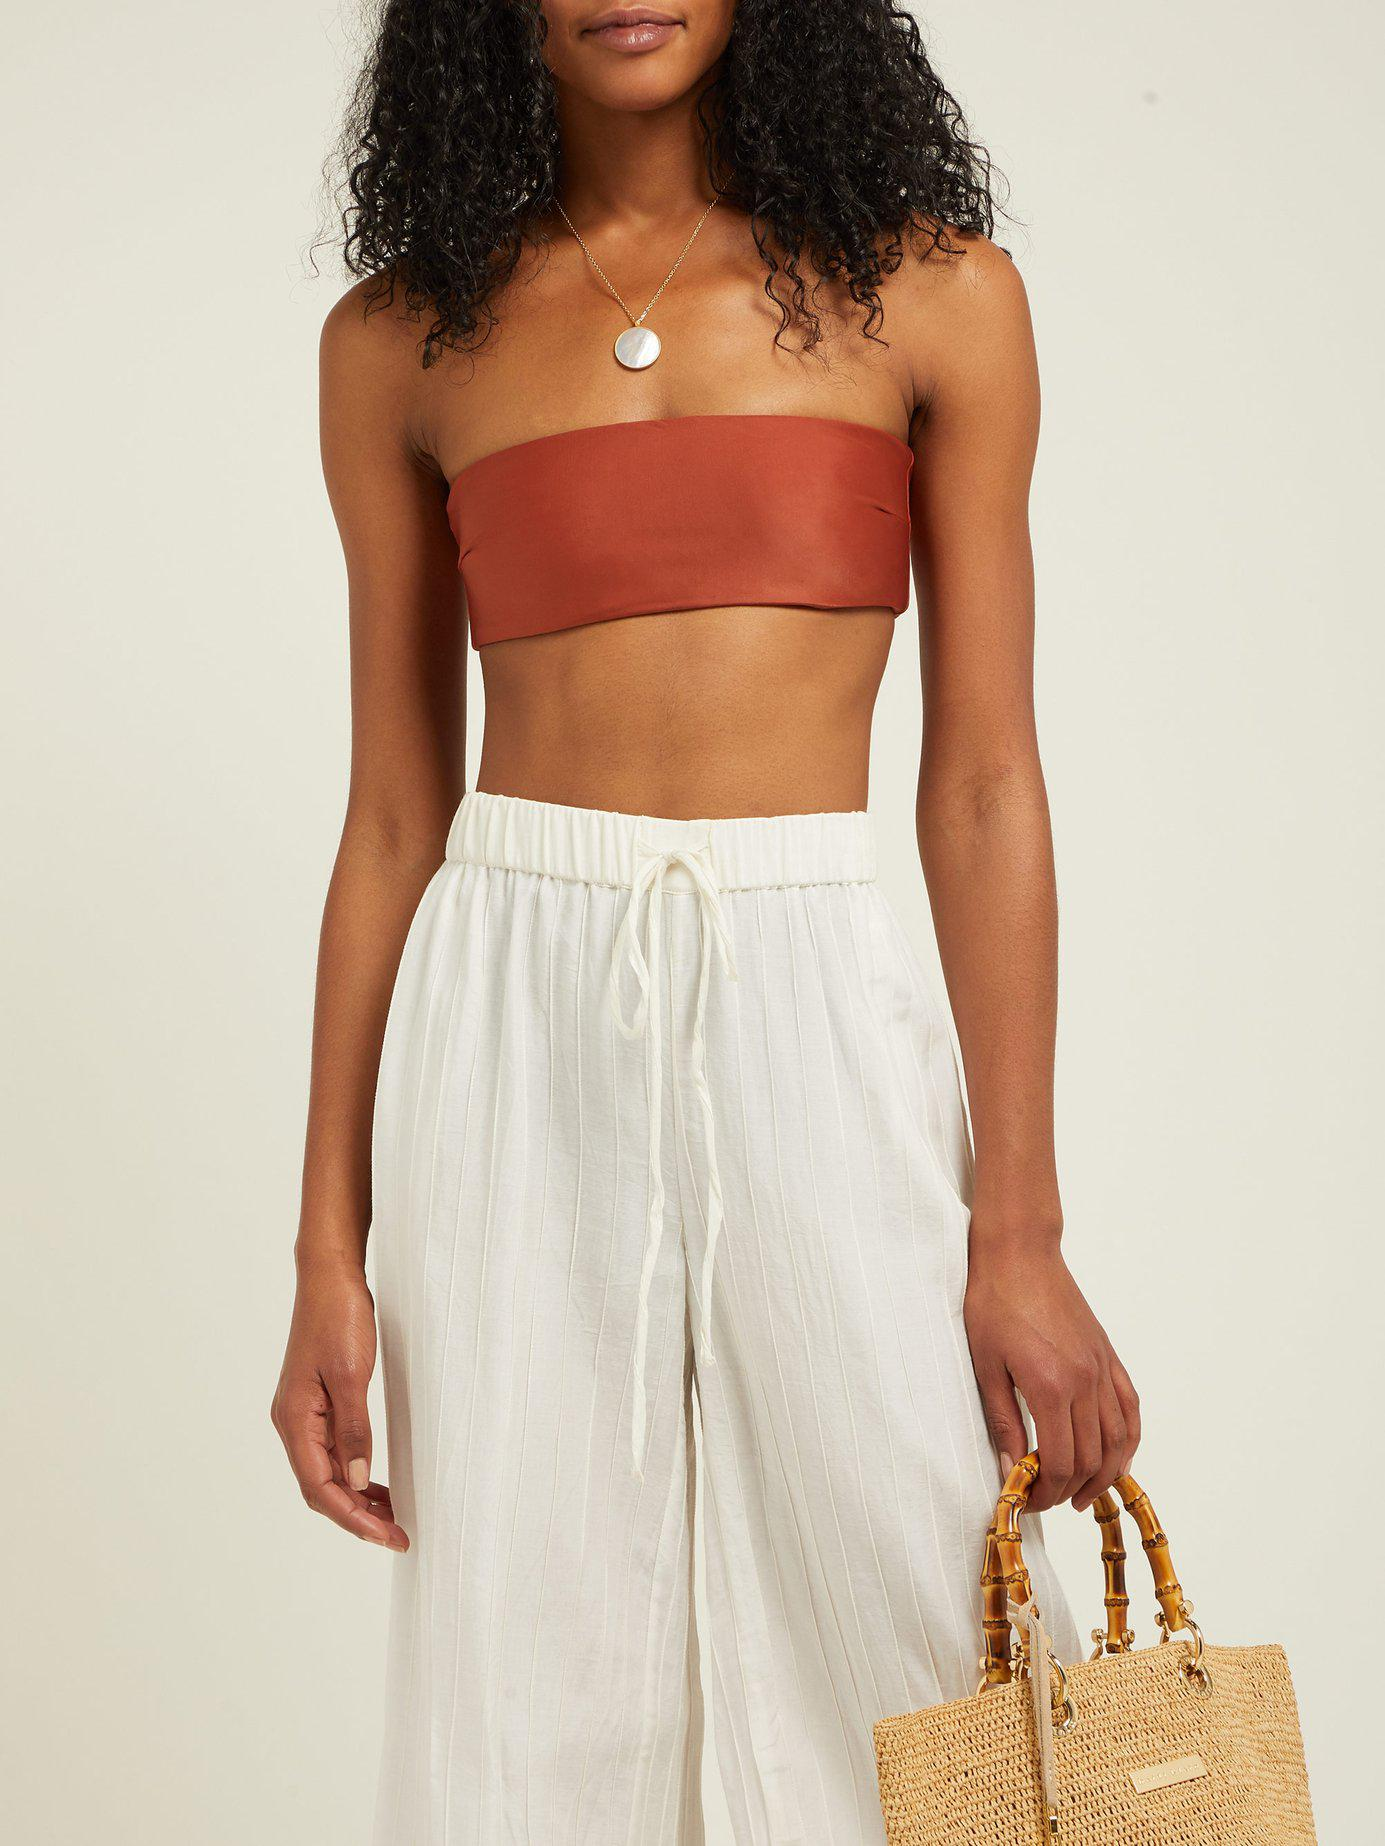 138db7fb11 Lyst - Haight Marcella Two Tone Bandeau Bikini Set in Brown